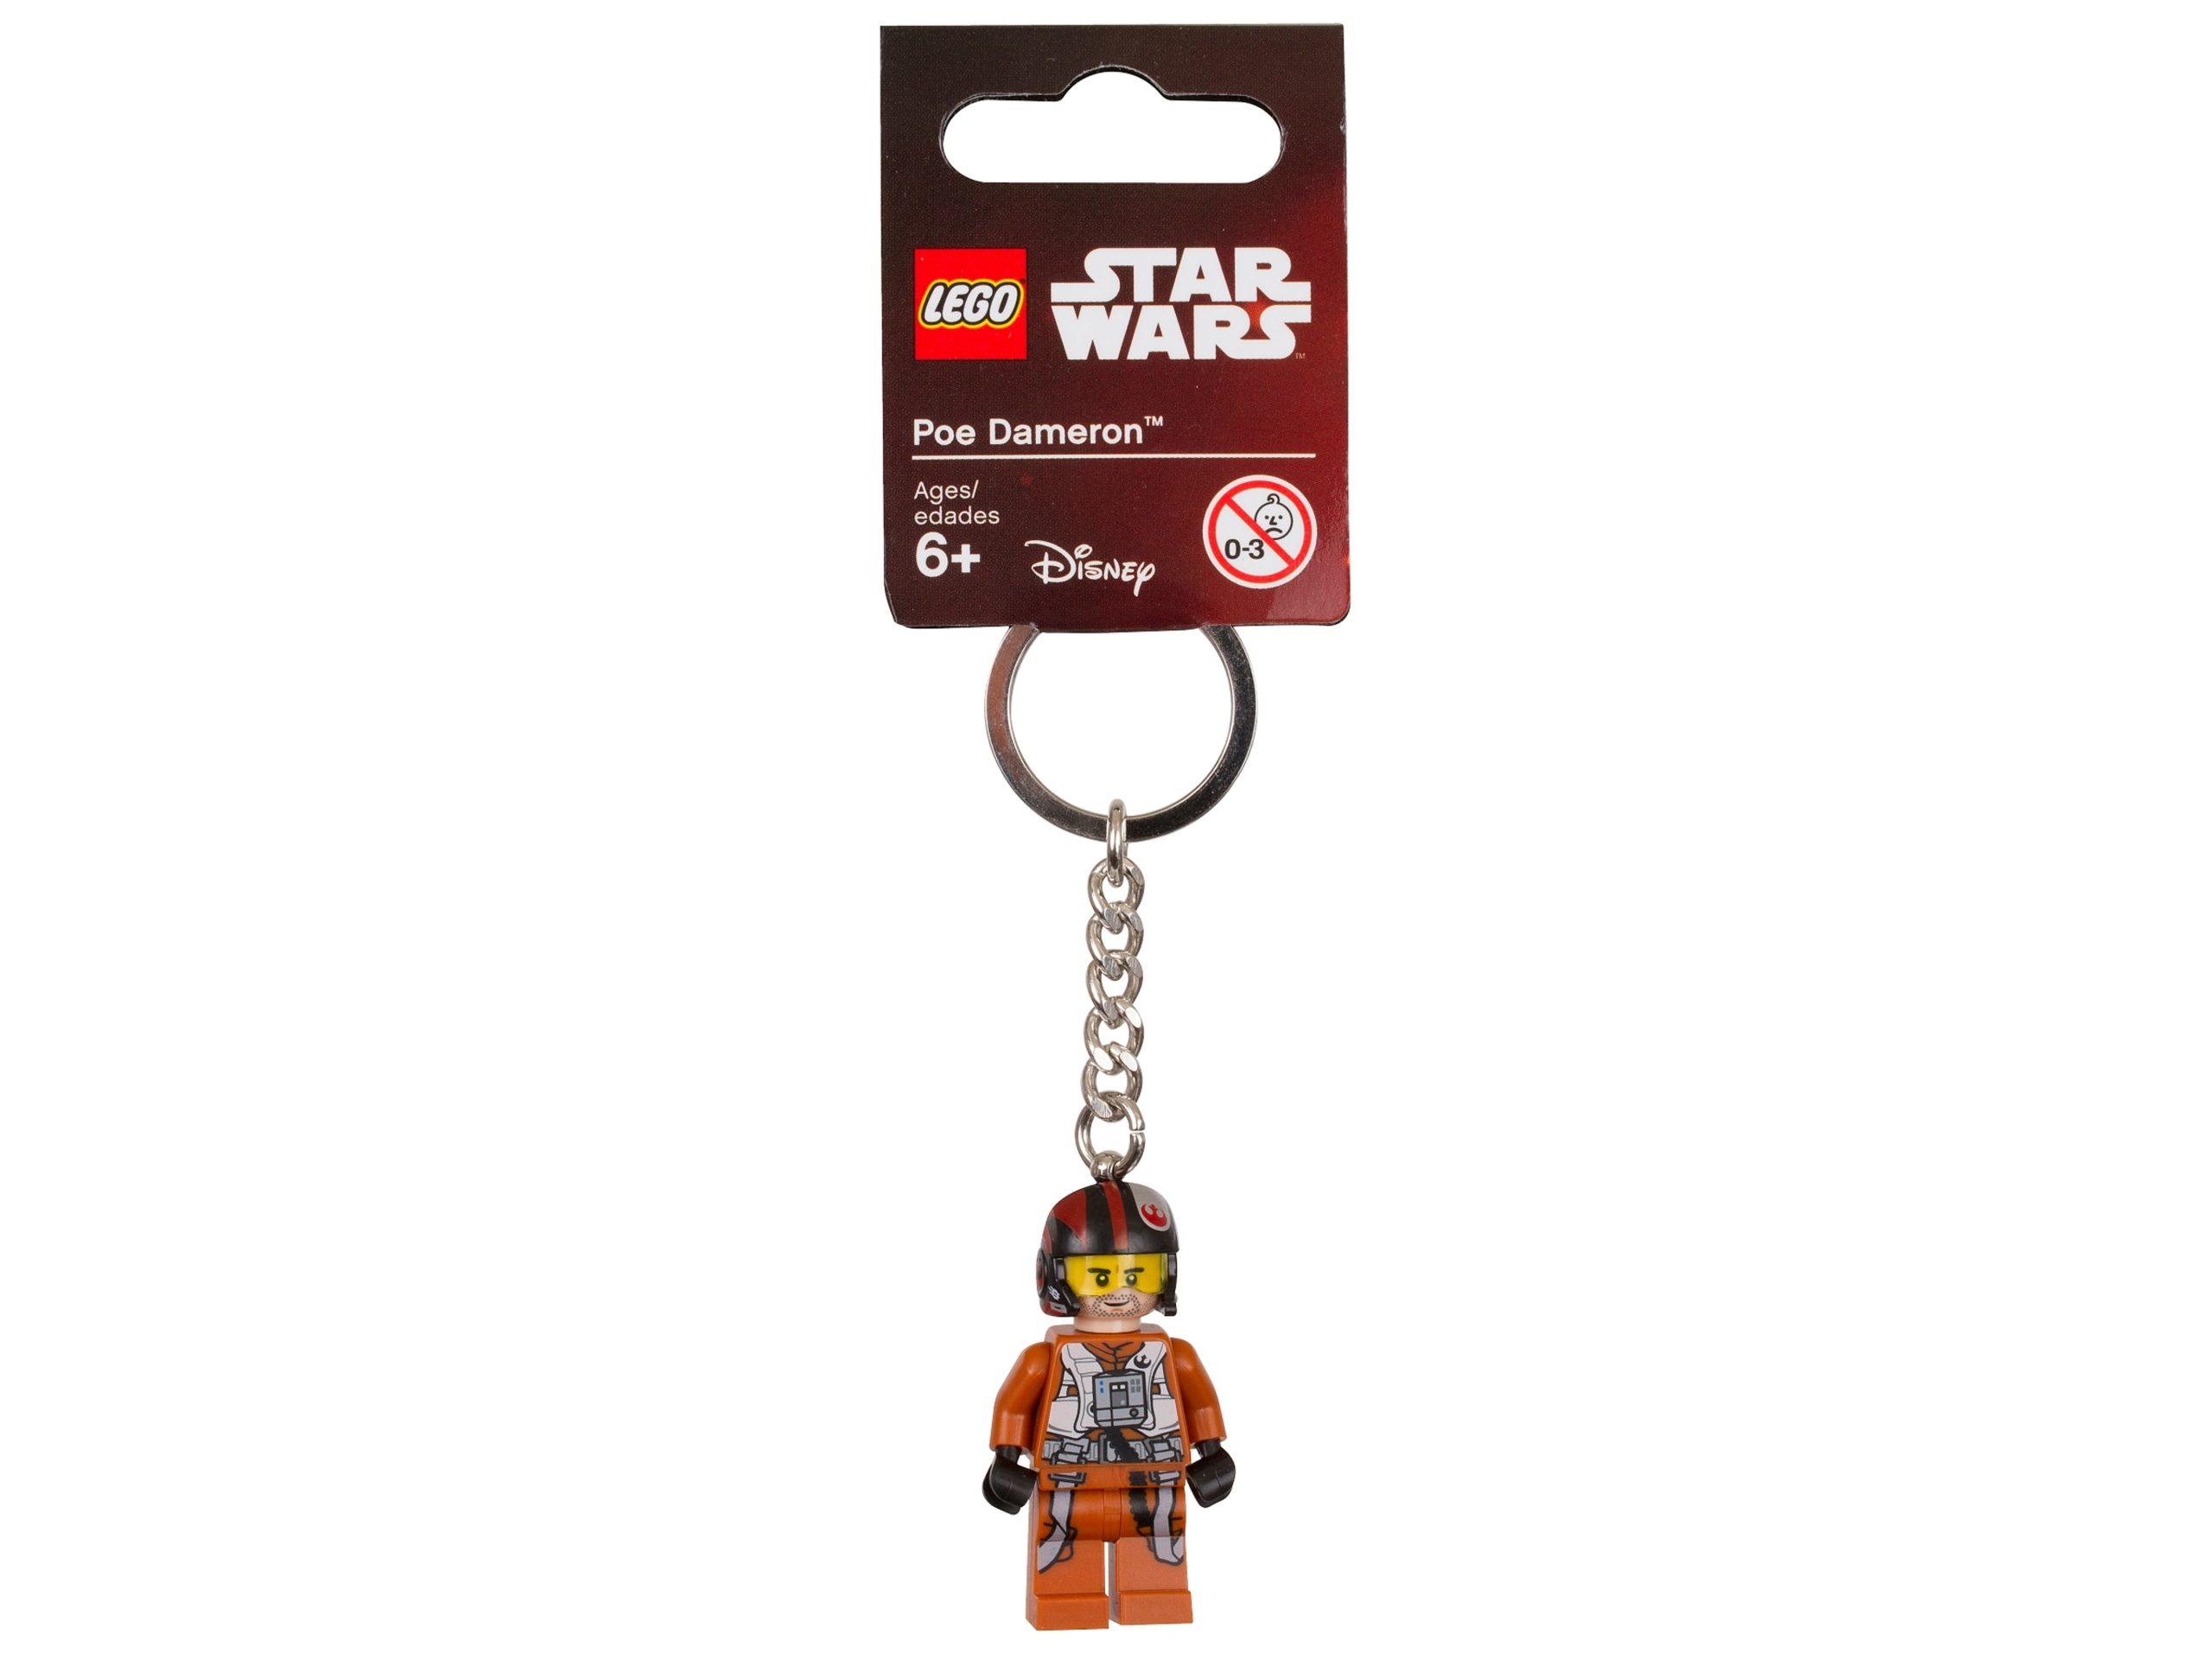 lego 853605 star wars poe dameron key chain scaled